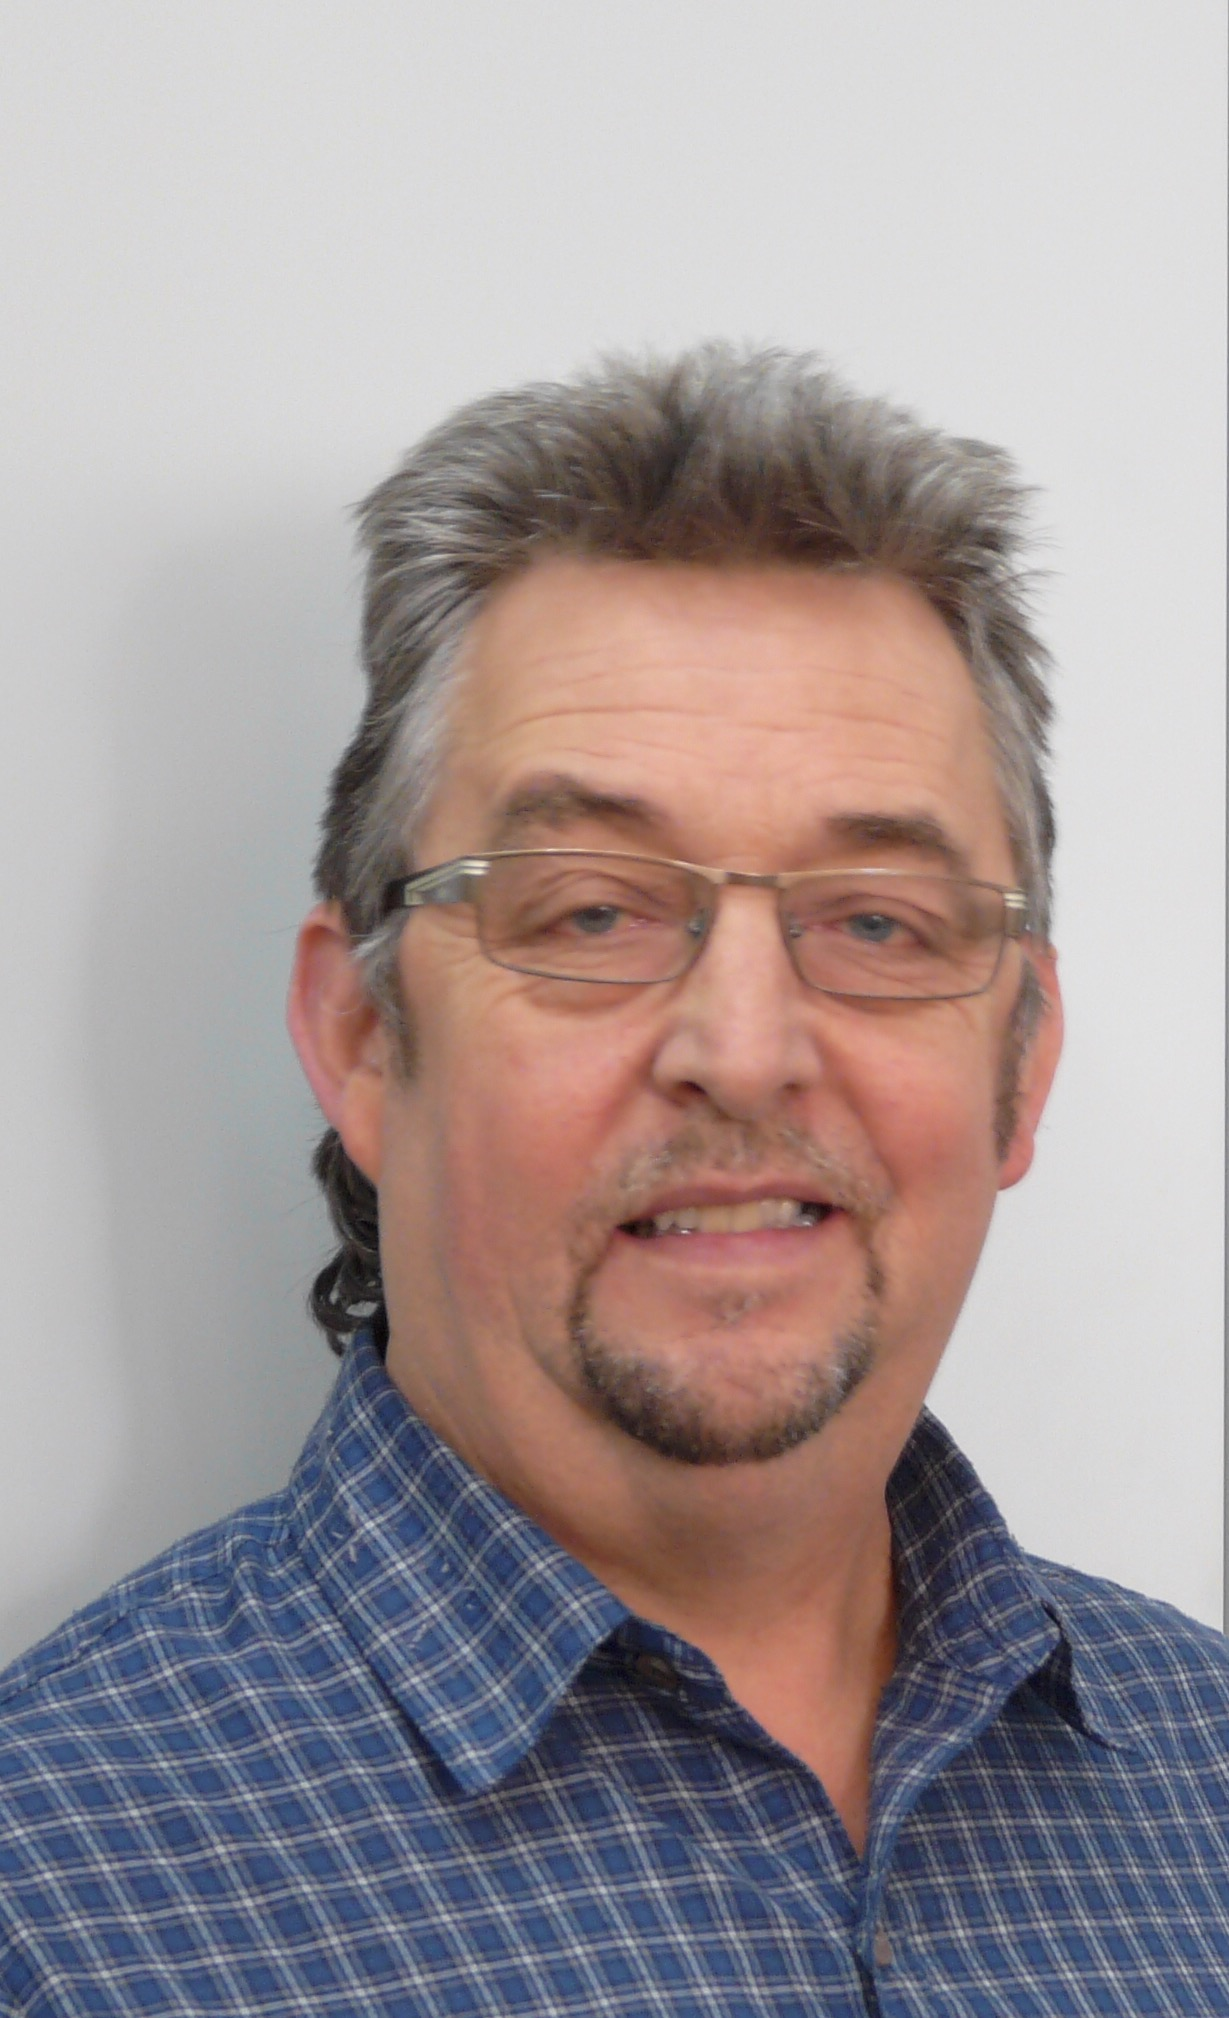 Rolf Rohner